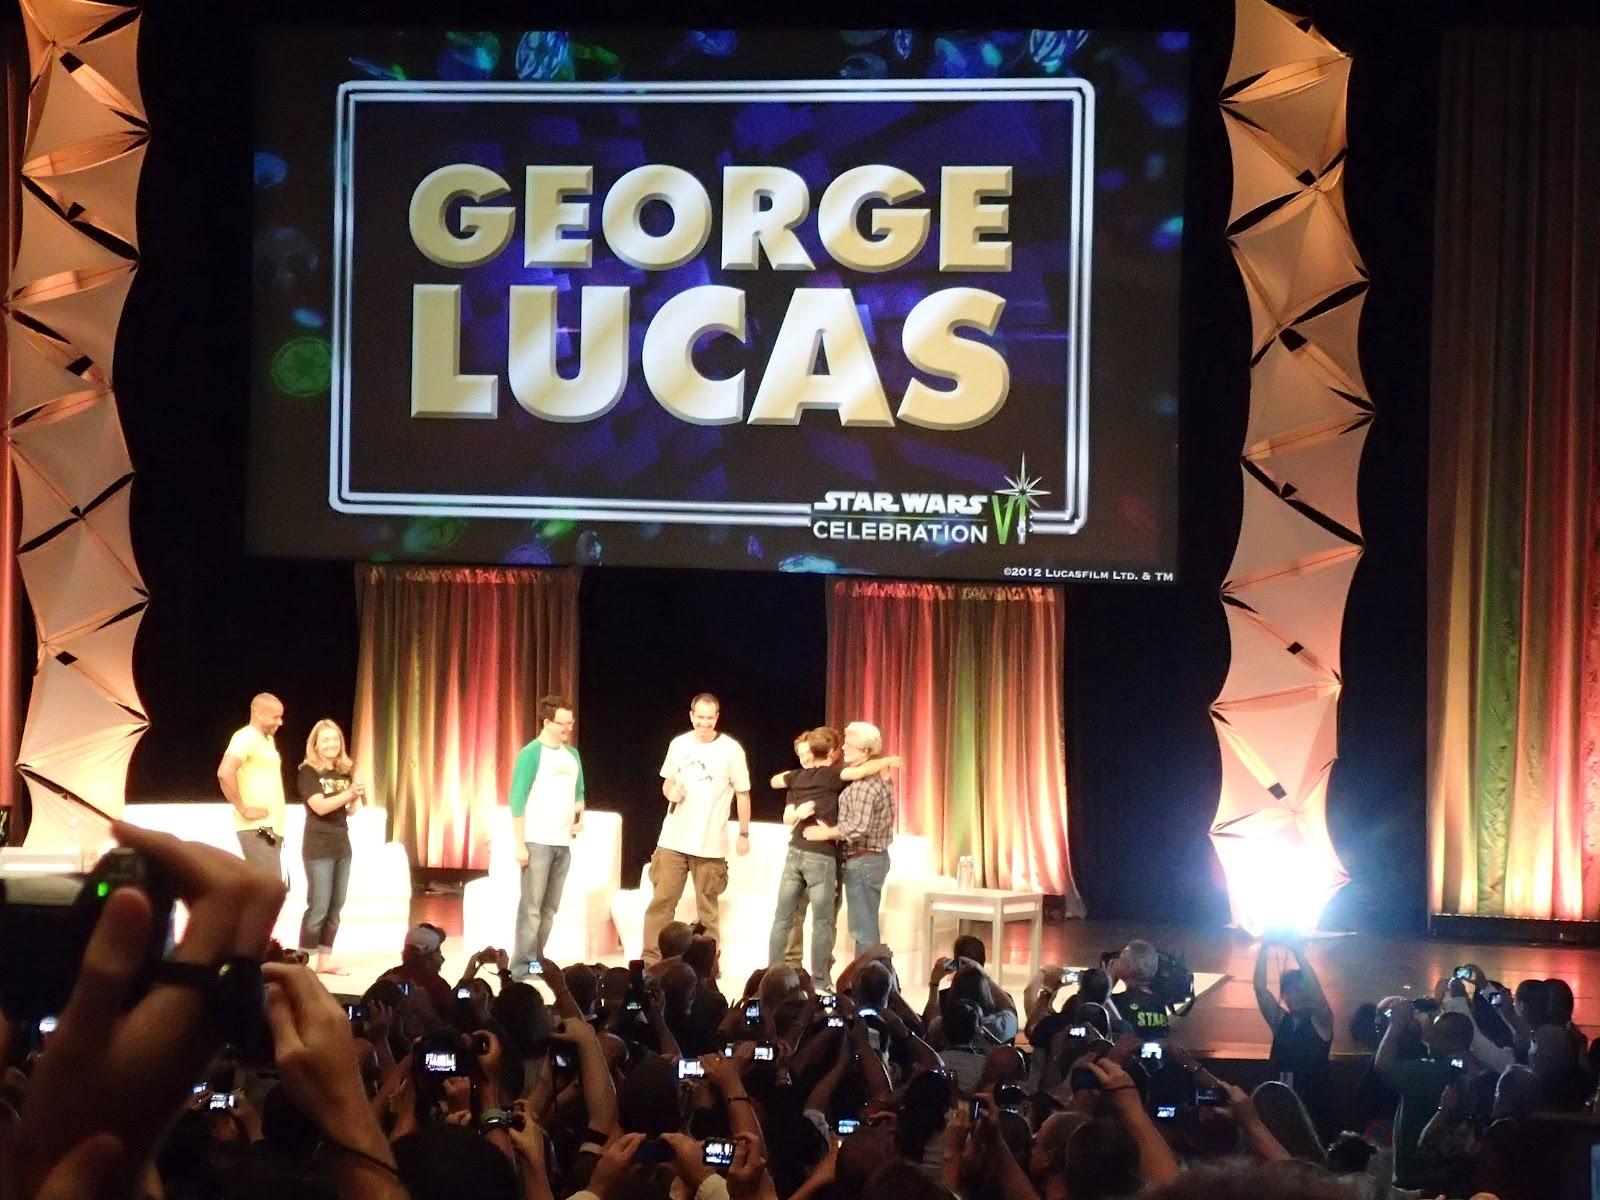 George lucas is an asshole